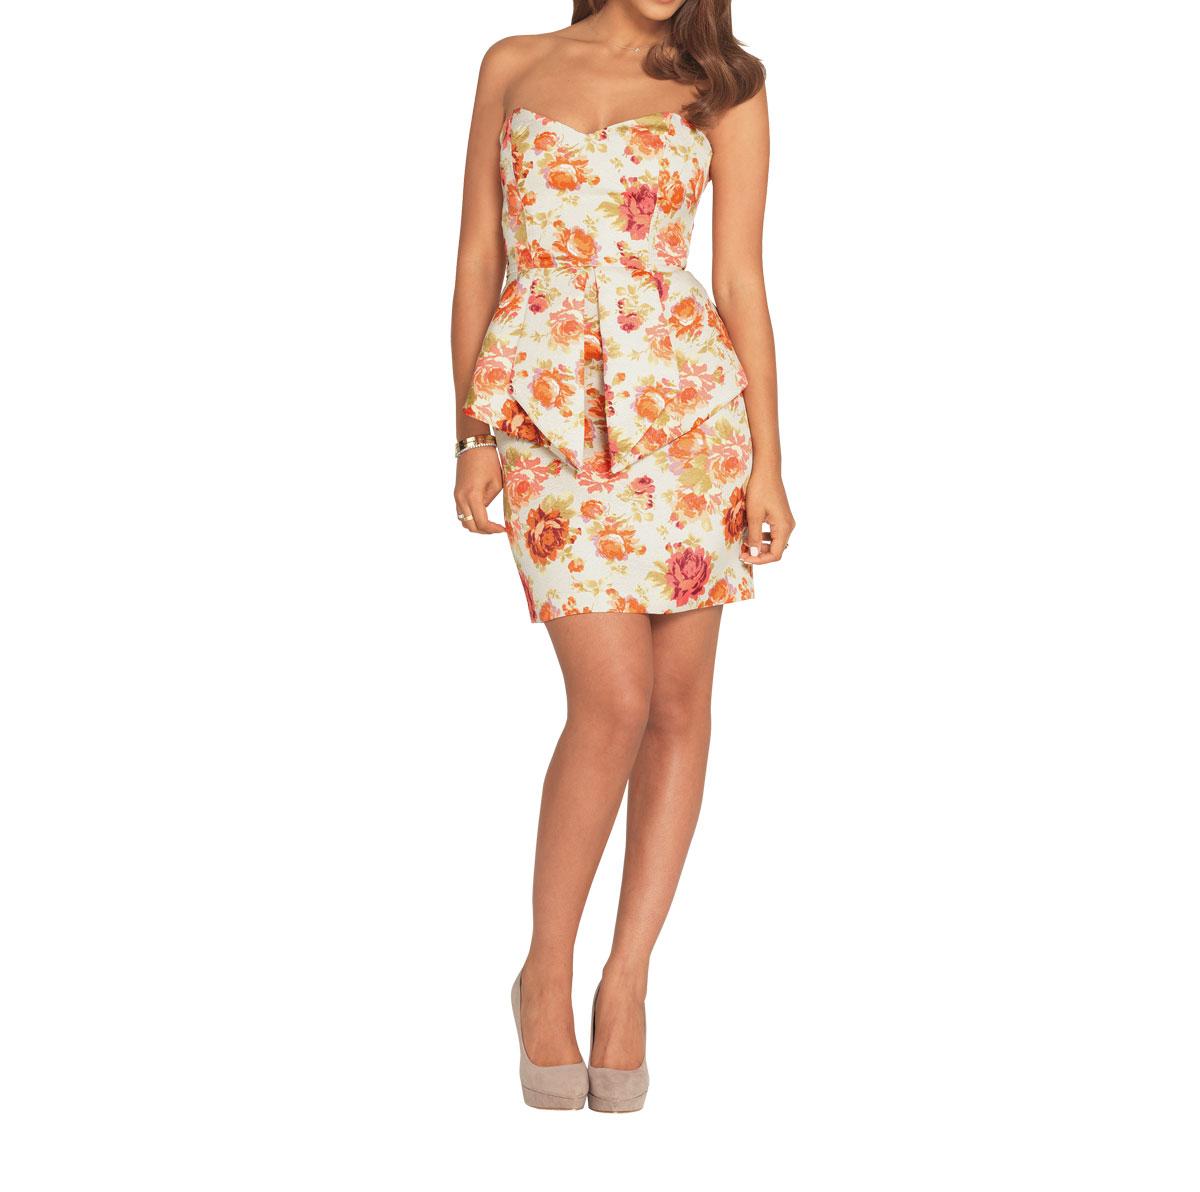 Very Floral Jacquard Peplum Mini Dress.